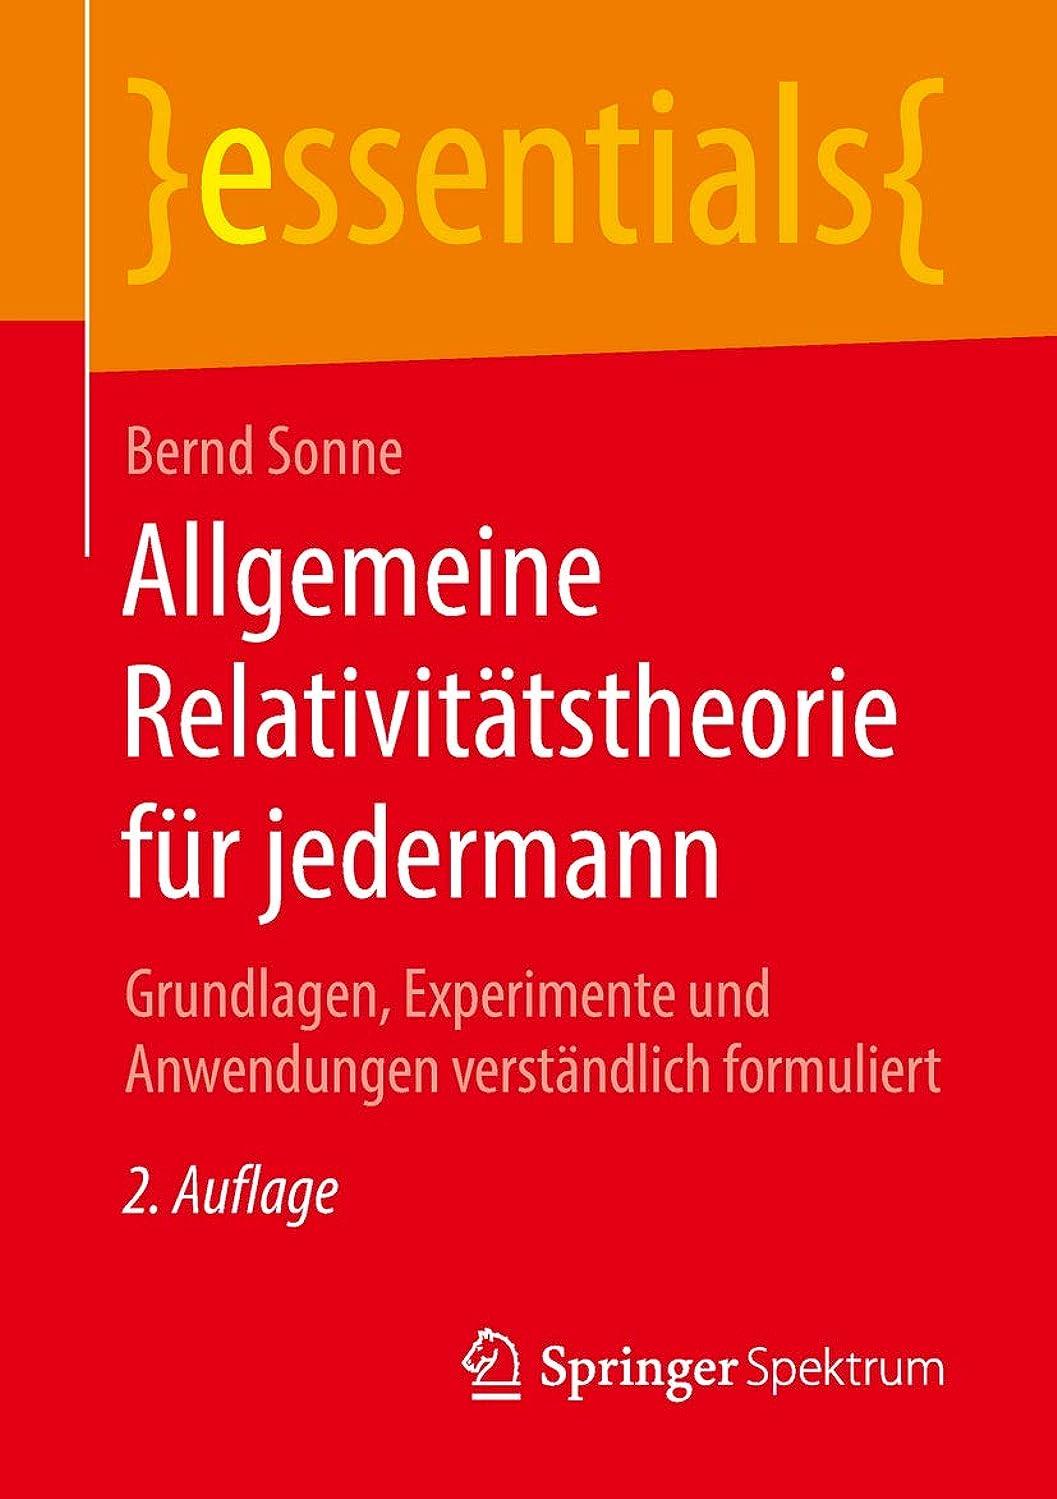 立場高層ビル敬意Allgemeine Relativit?tstheorie für jedermann: Grundlagen, Experimente und Anwendungen verst?ndlich formuliert (essentials) (German Edition)